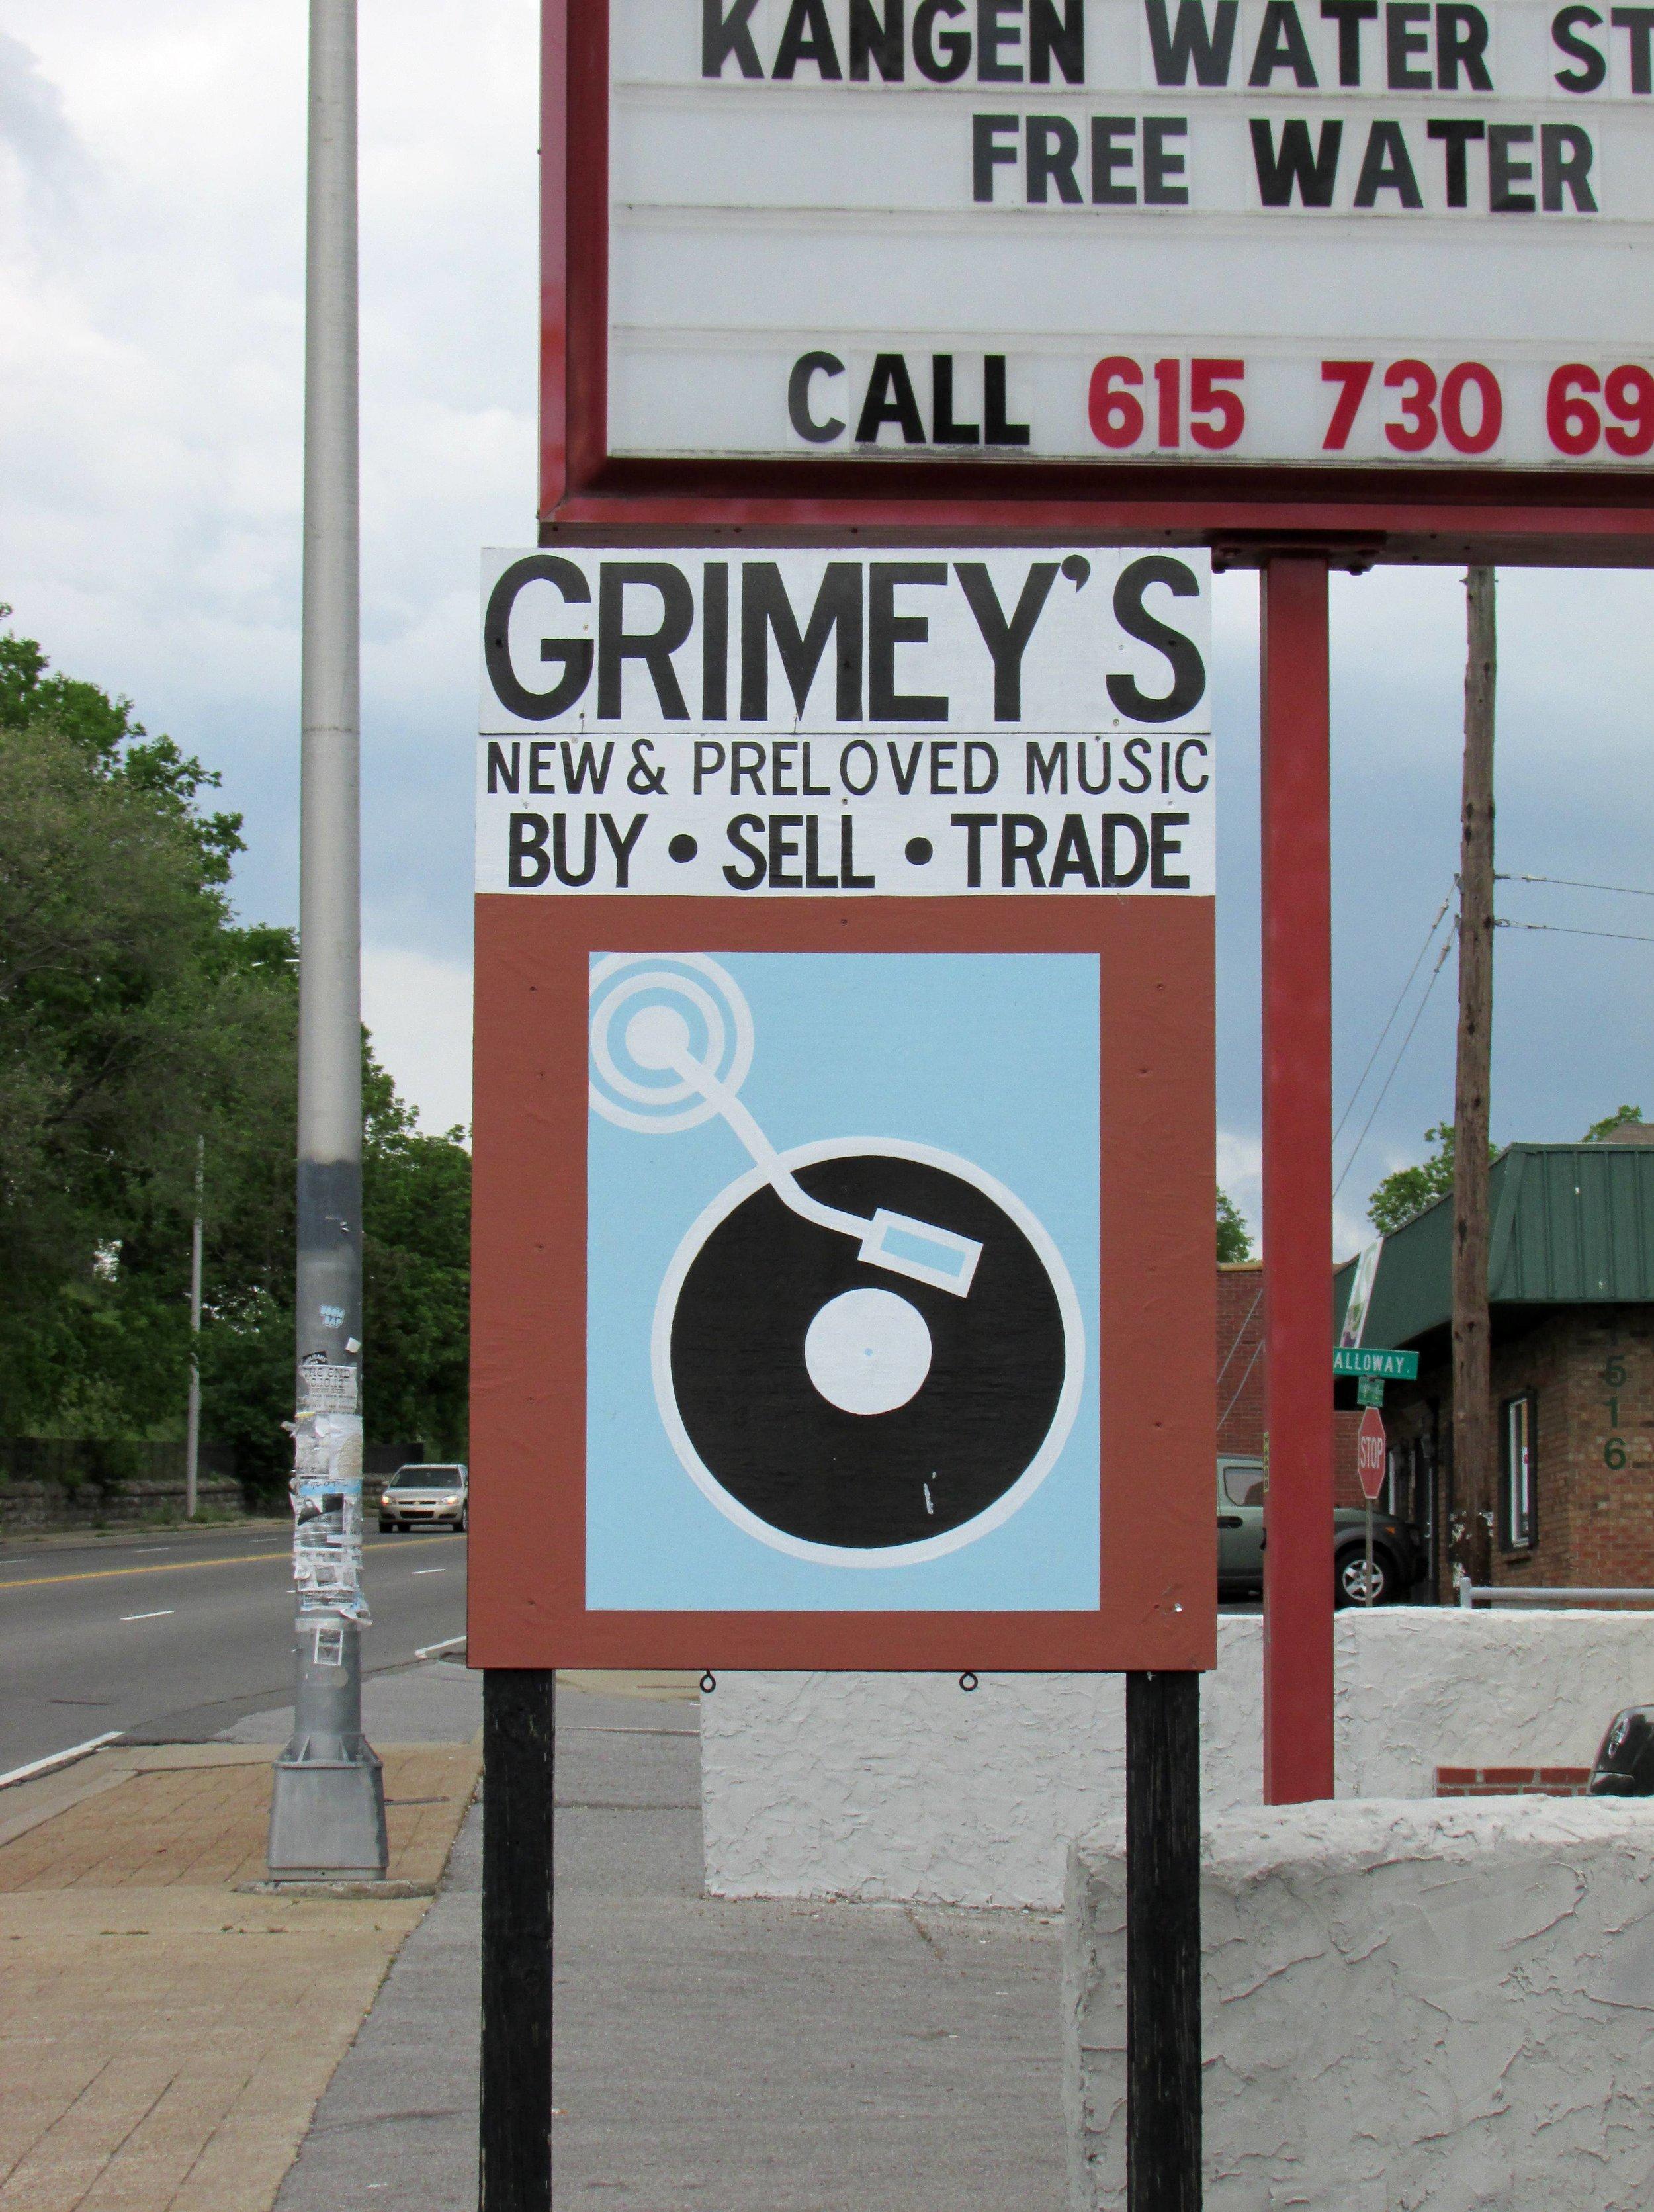 Grimey's New & Preloved Music, Nashville, Tennessee